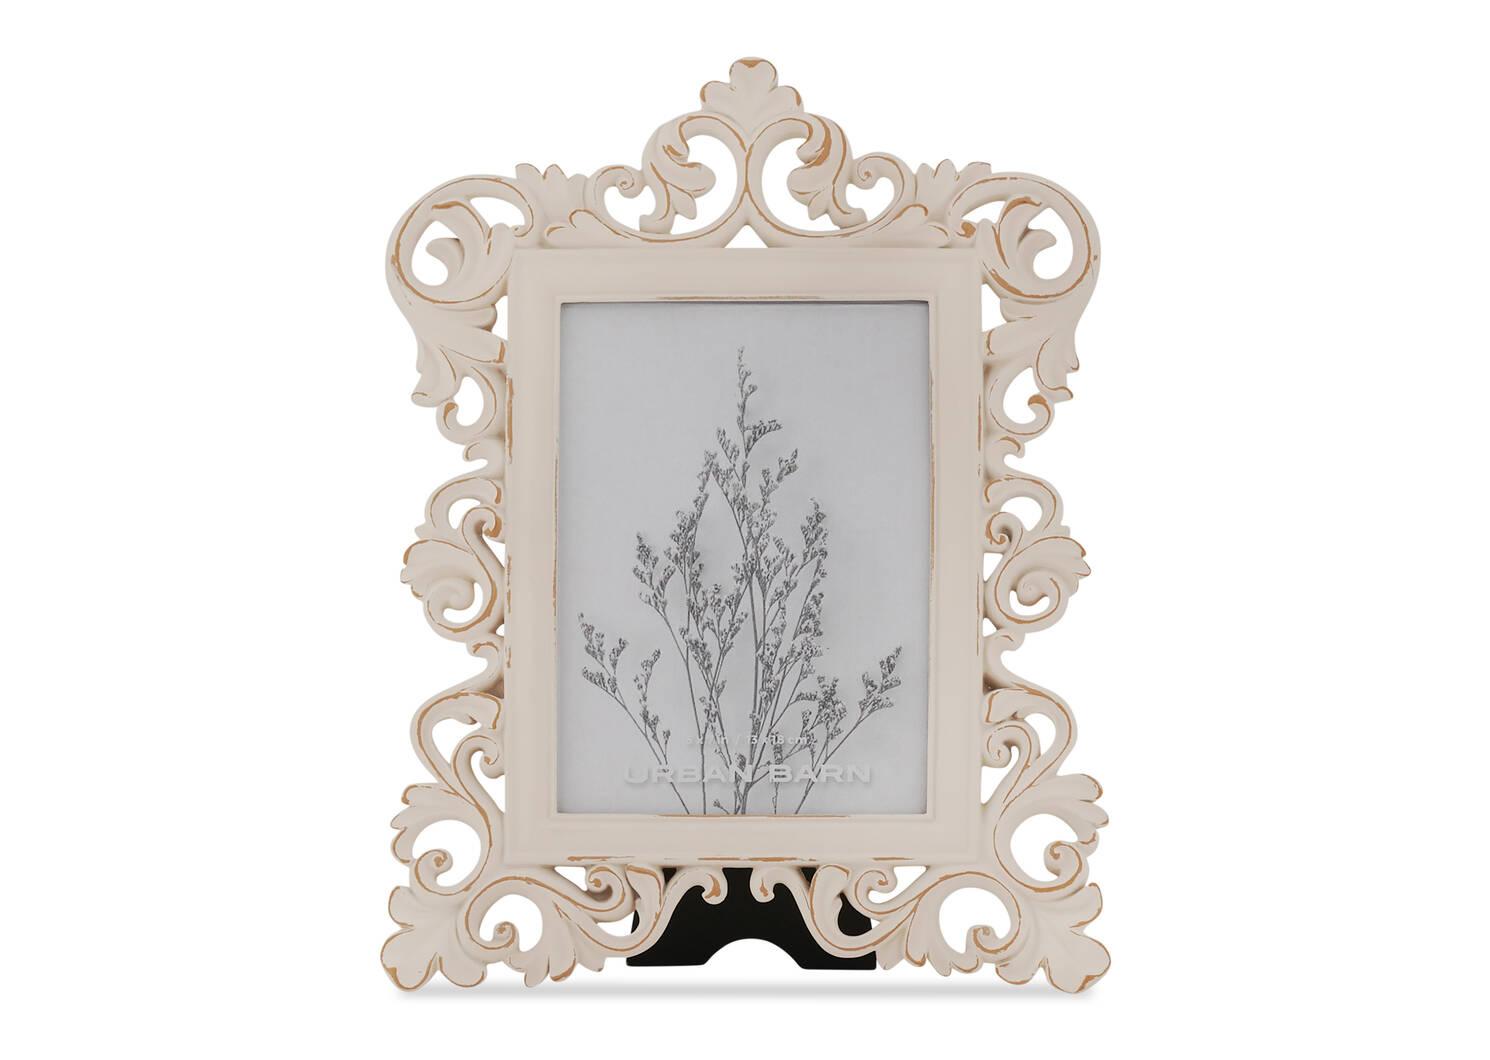 Cadre vert. Lillianna 5x7 blanc antique